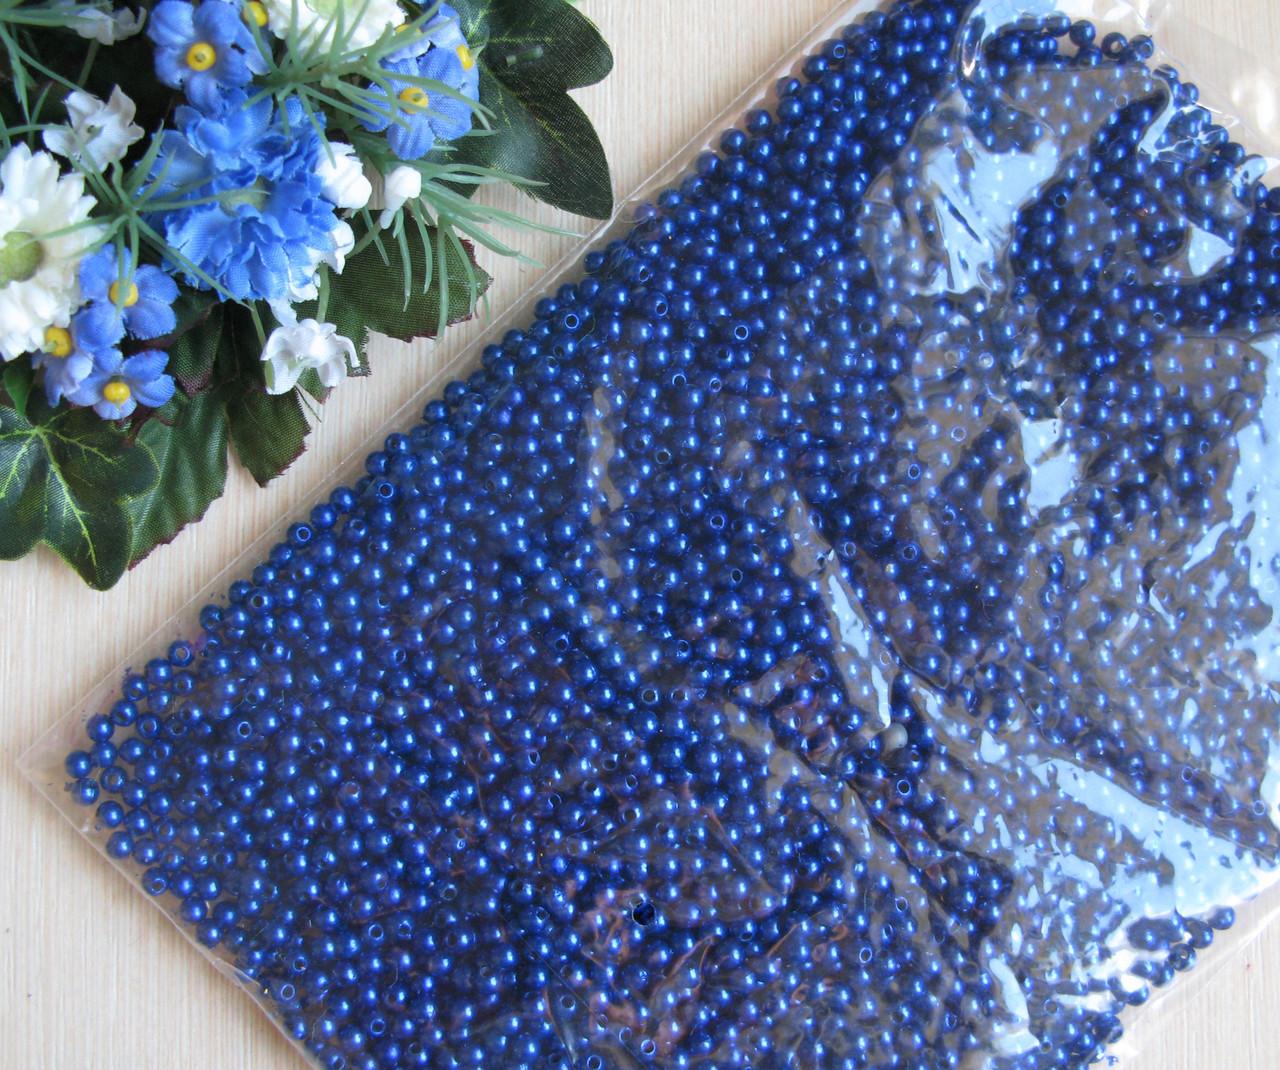 Жемчуг синий диаметр 4 мм Вес упаковки 10 г около 330 шт